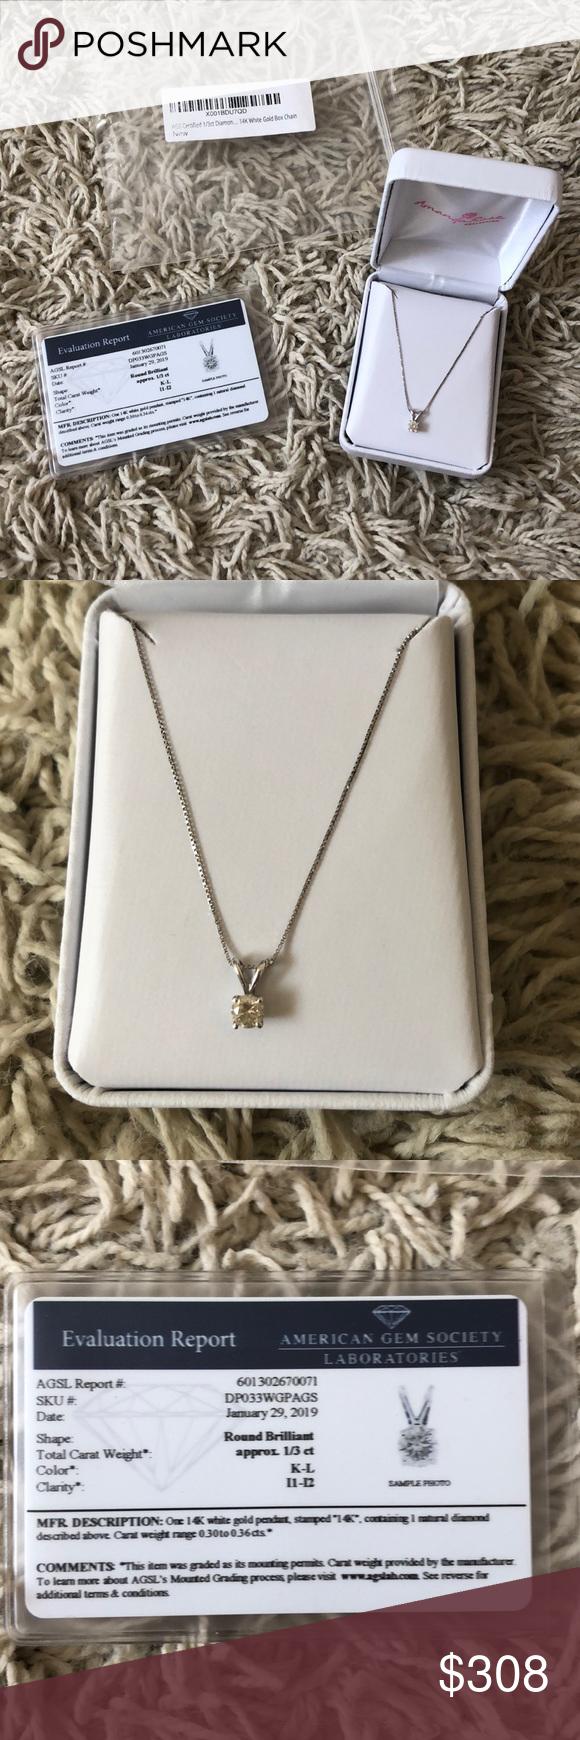 Diamond Necklace 1 3 Carat 14k White Gold Chain White Gold Chains 14k White Gold Chain Gold Chains